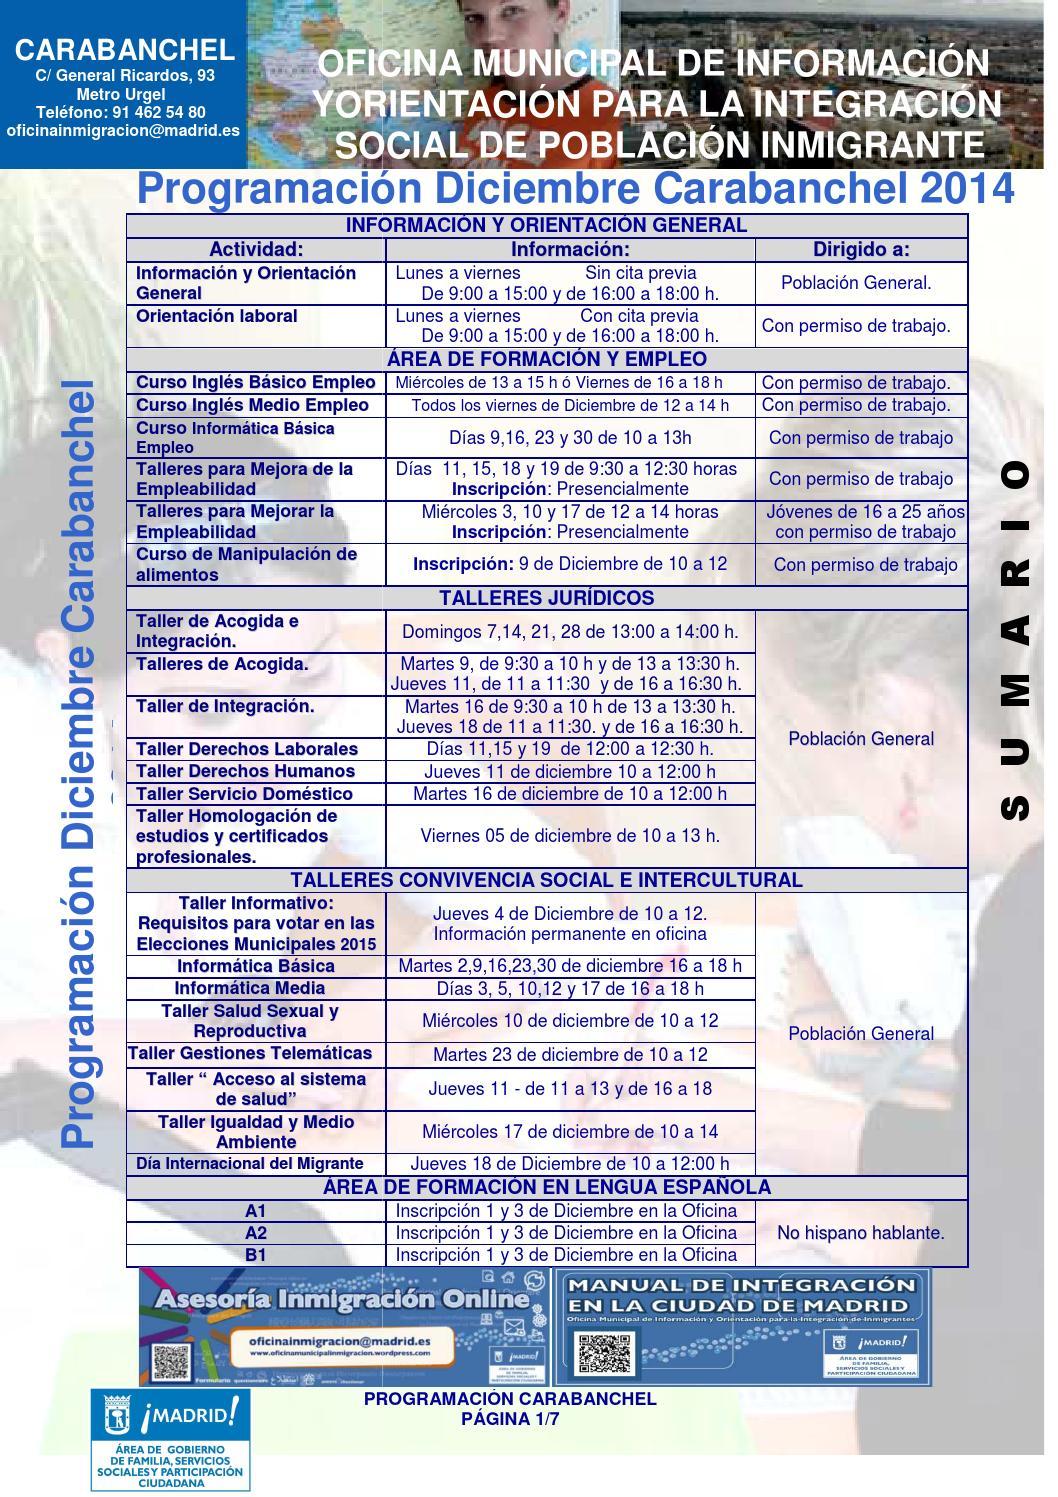 Programacion diciembre 14 carabanchel by oficina for Oficina de empleo carabanchel